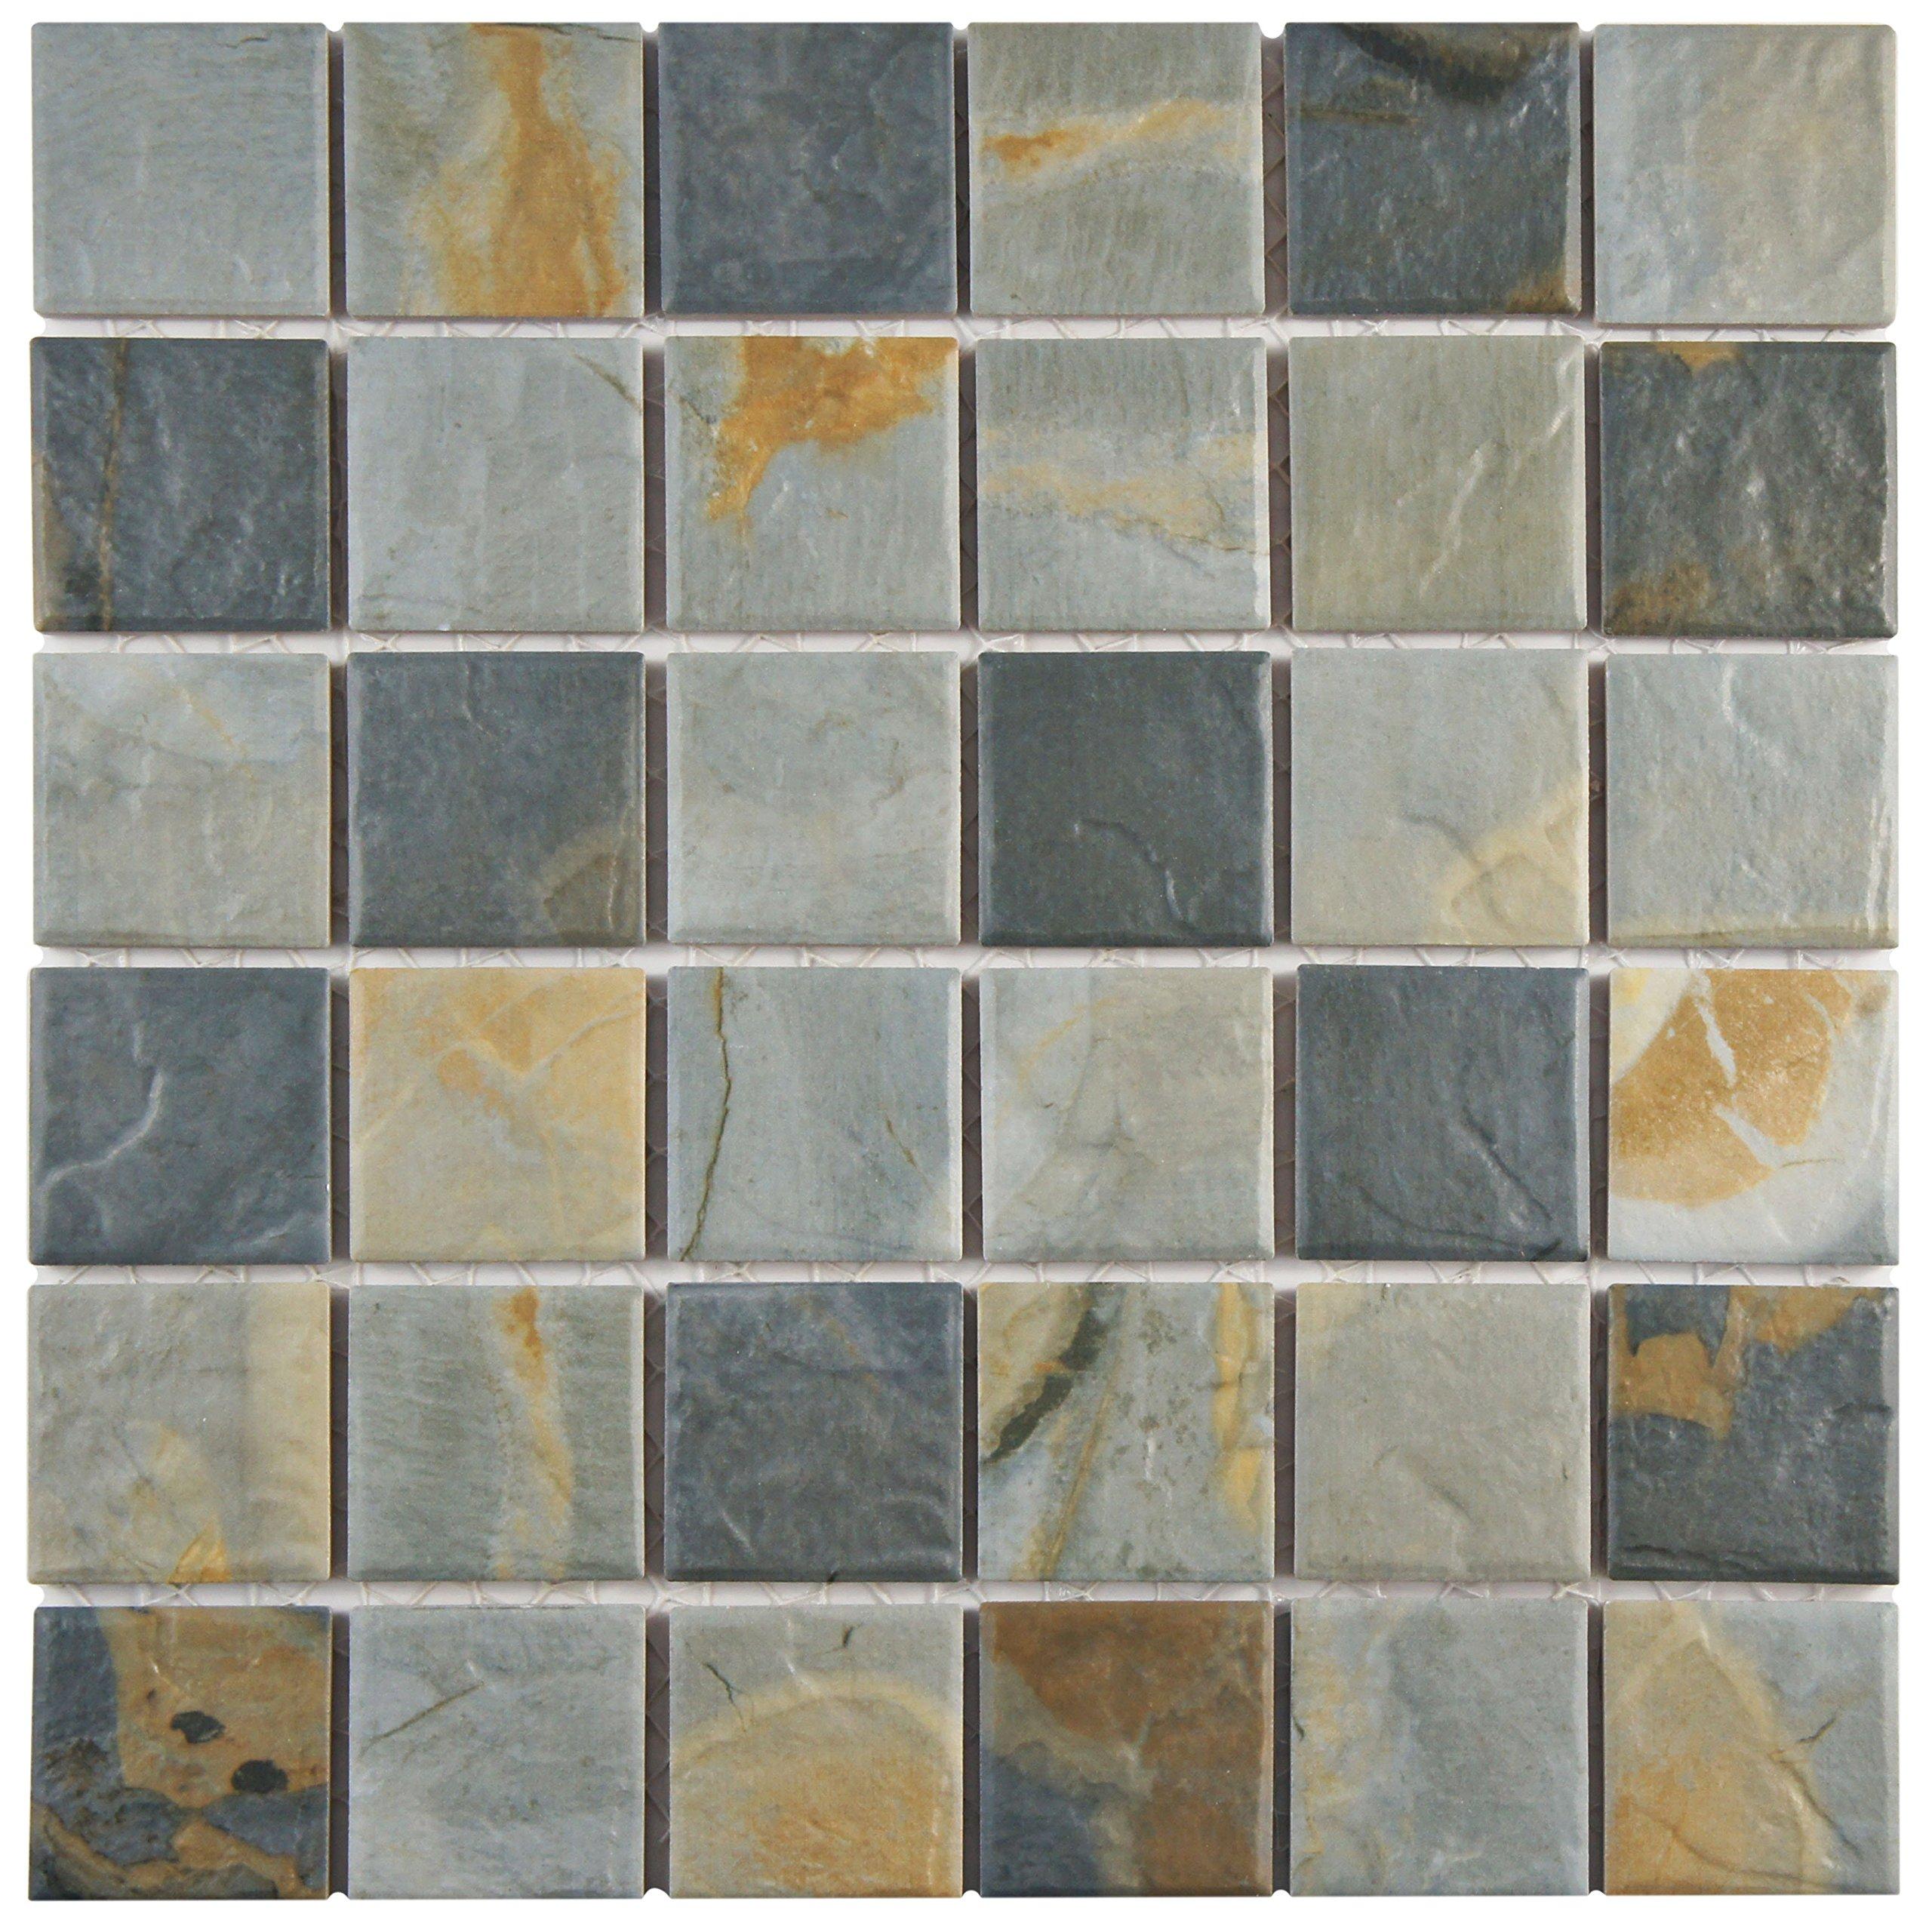 SomerTile WTCARDSL Tegola Glazed Porcelain Mosaic Floor and Wall Tile, 11.625'' x 11.625'' x 0.24'', Slate Gray